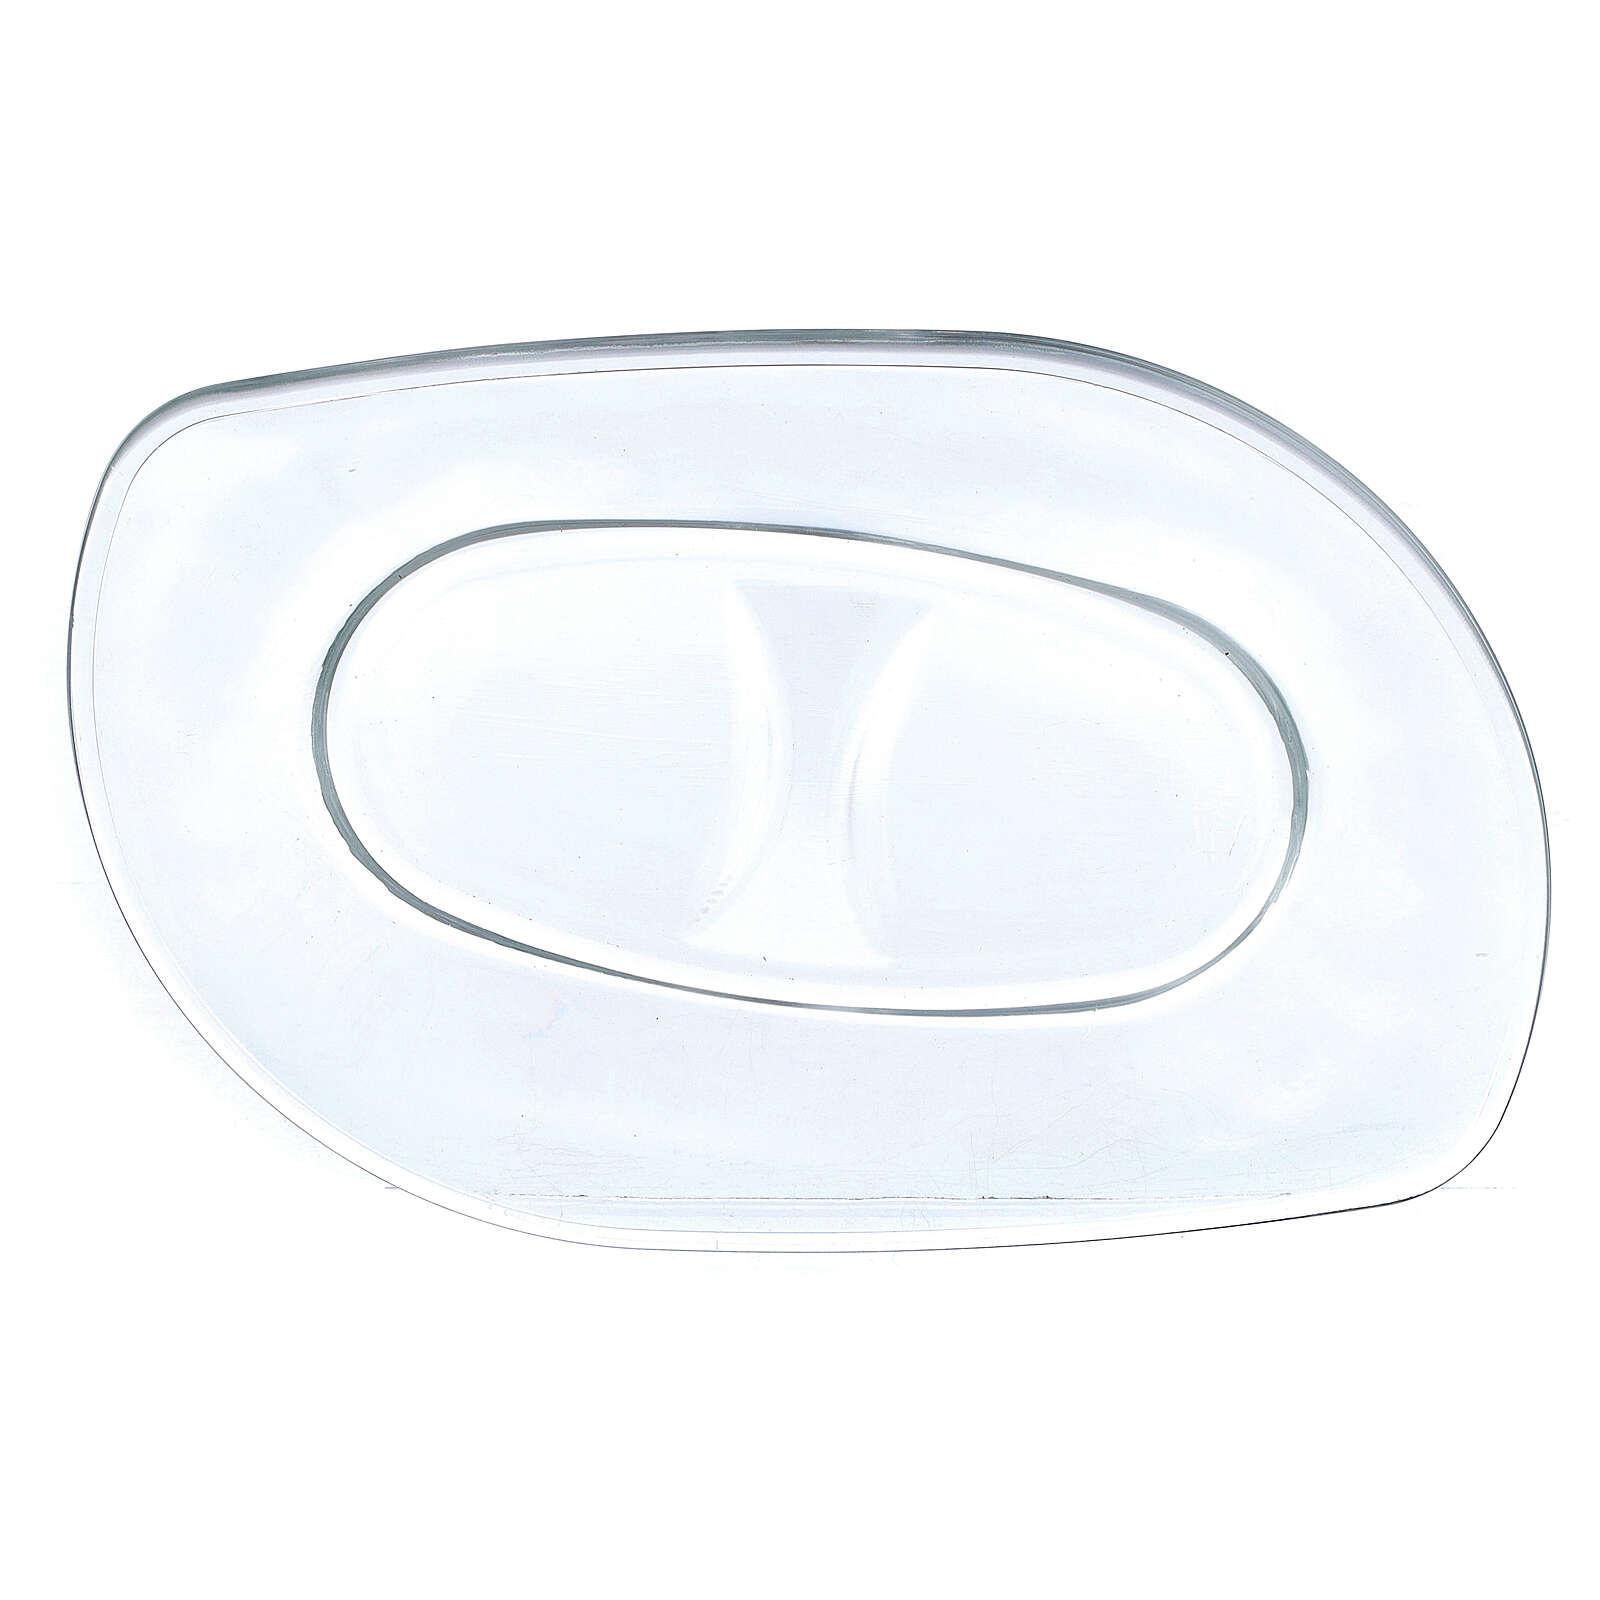 Glass cruet set with tray, 50 ml 4